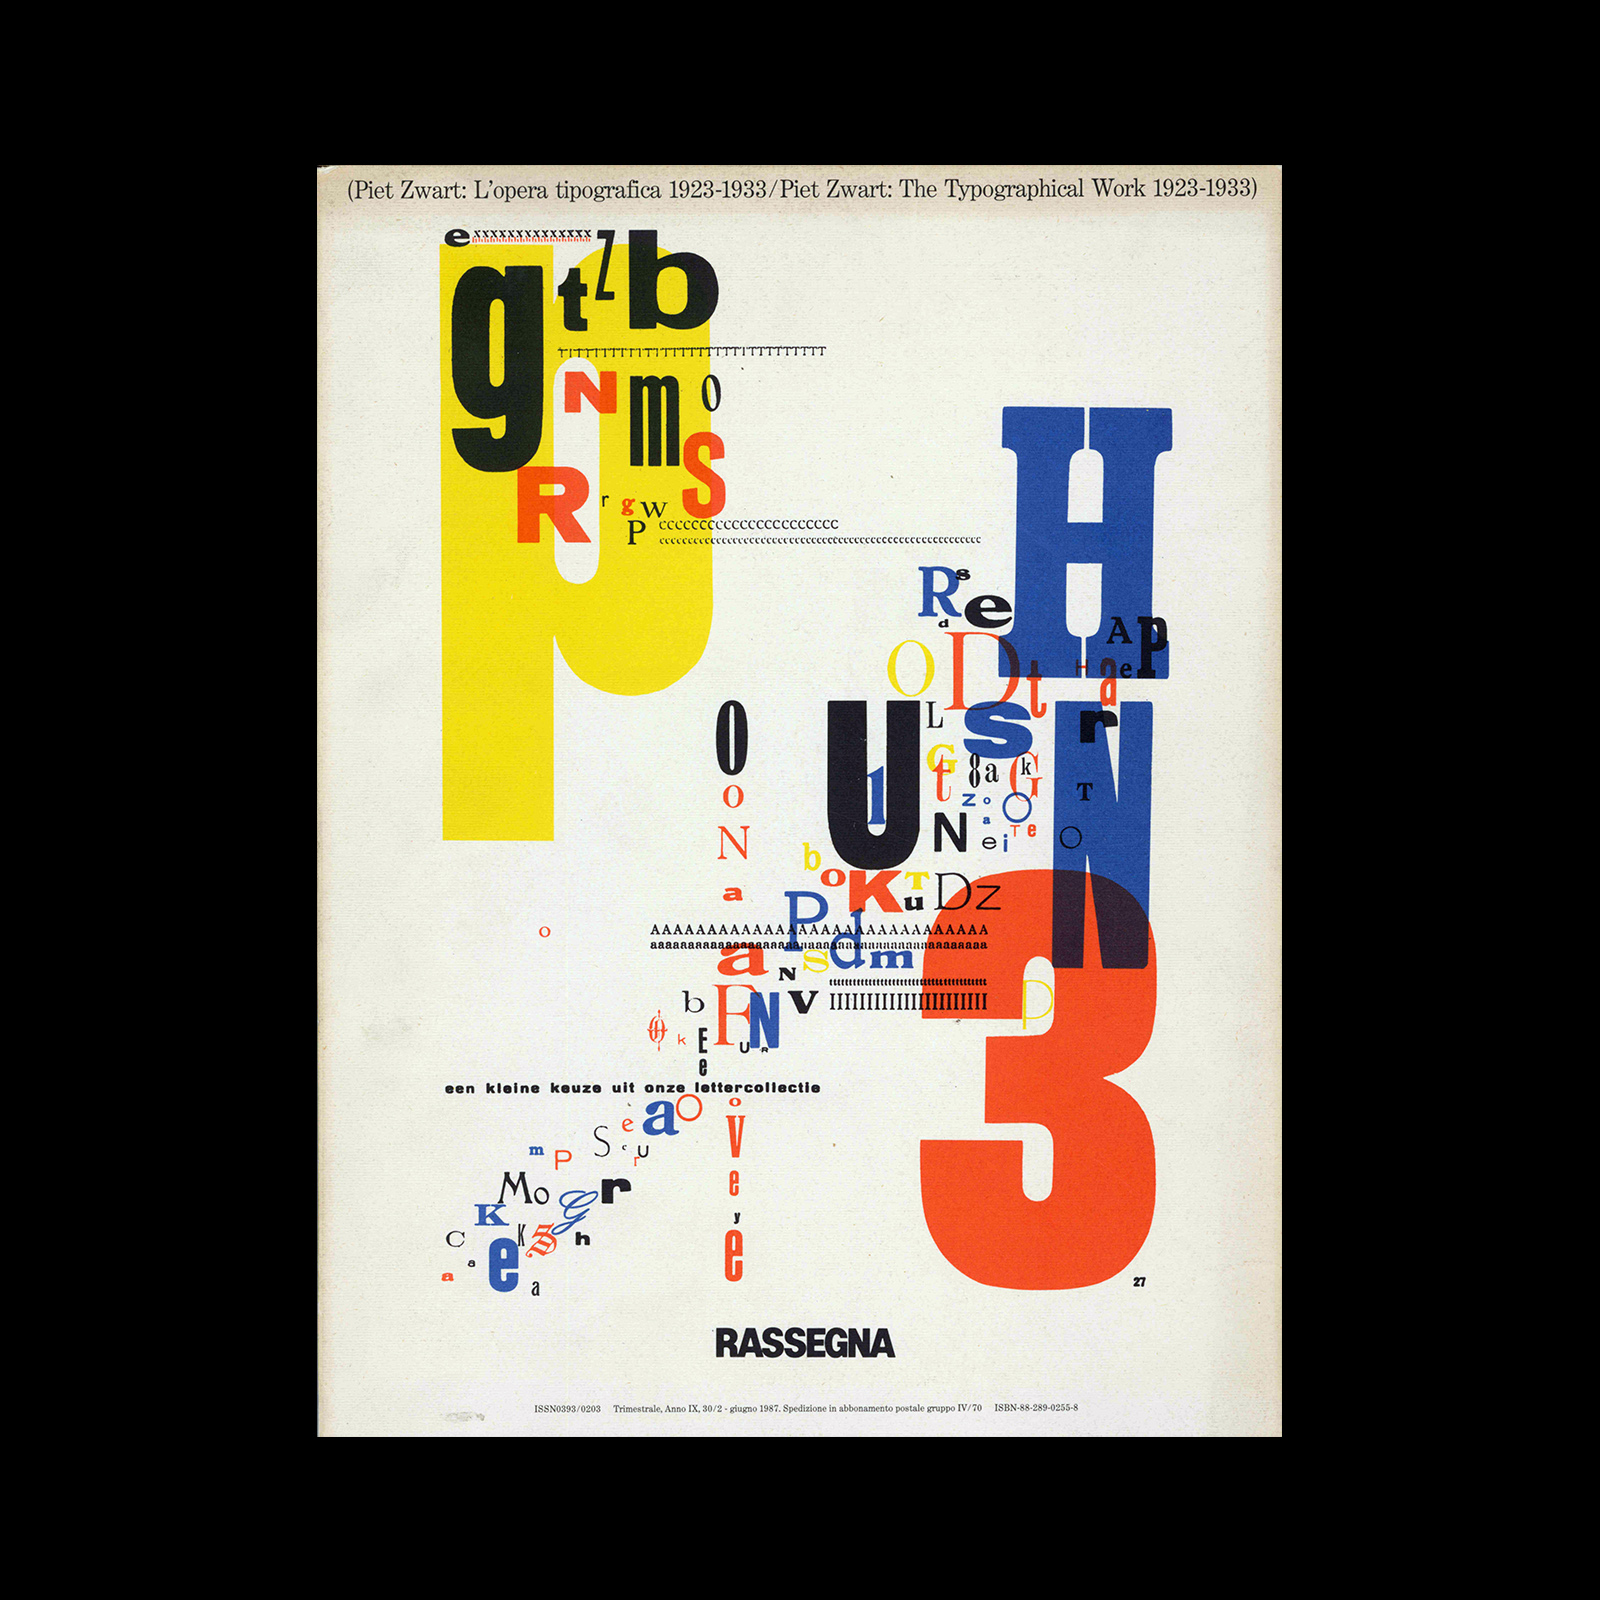 Rassegna 30: Piet Zwart: L'opera Tipografica 1923-1933 / Piet Zwart, the typographical work 1923-1933, 1987